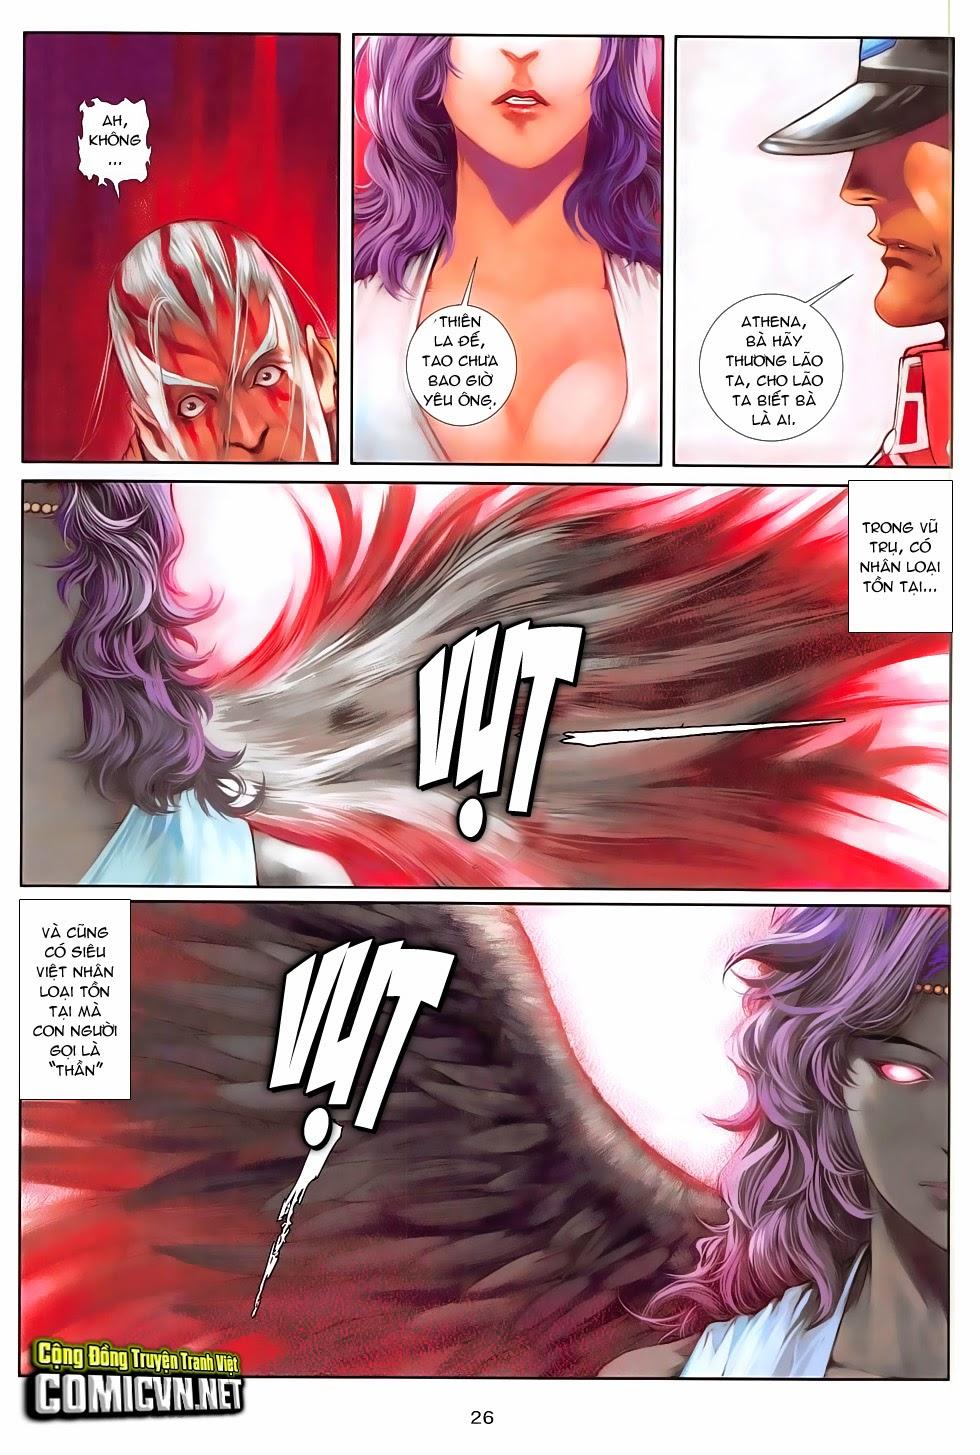 Ba Động Quyền Z Hadouken Zero chap 15 - Trang 26